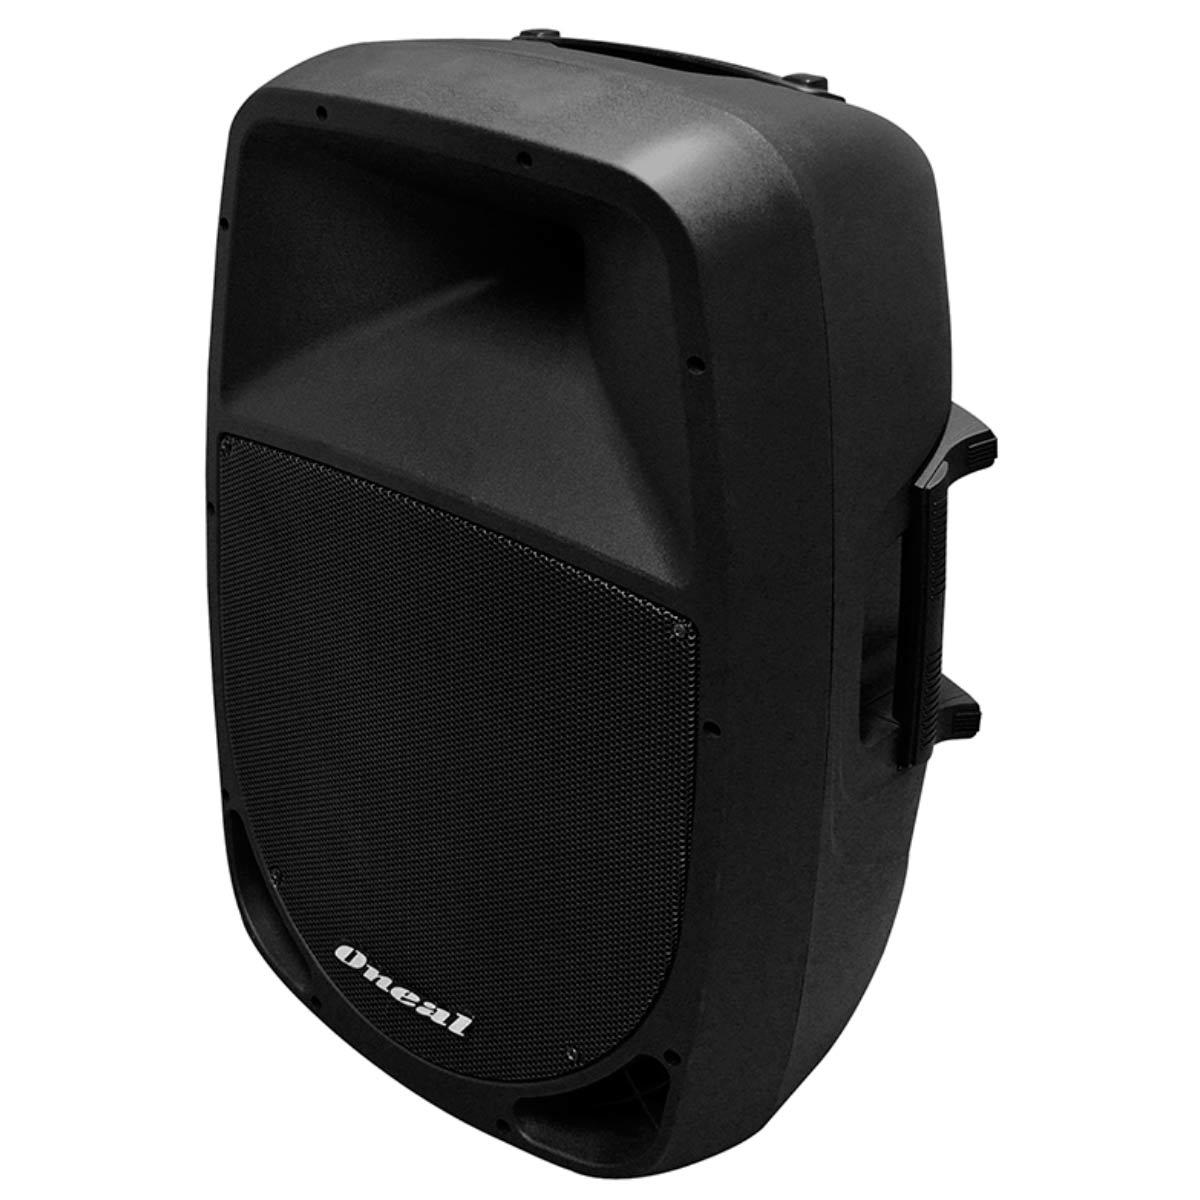 OPB1112BT - Caixa Ativa 200W c/ Bluetooth e USB OPB 1112BT - Oneal